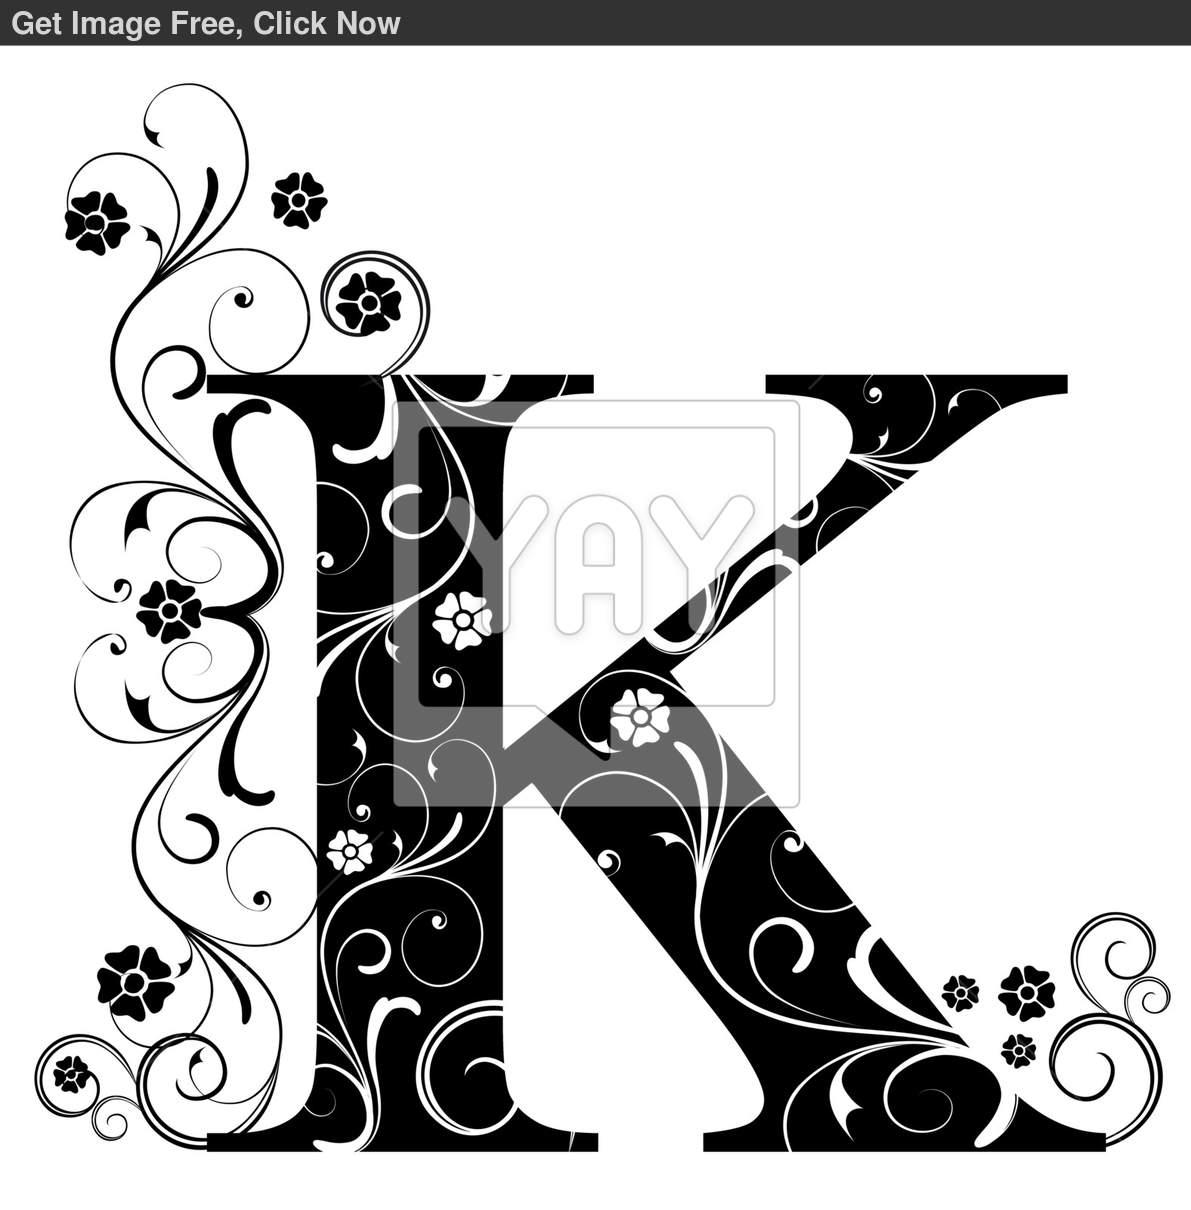 R Alphabet Love Wallpaper